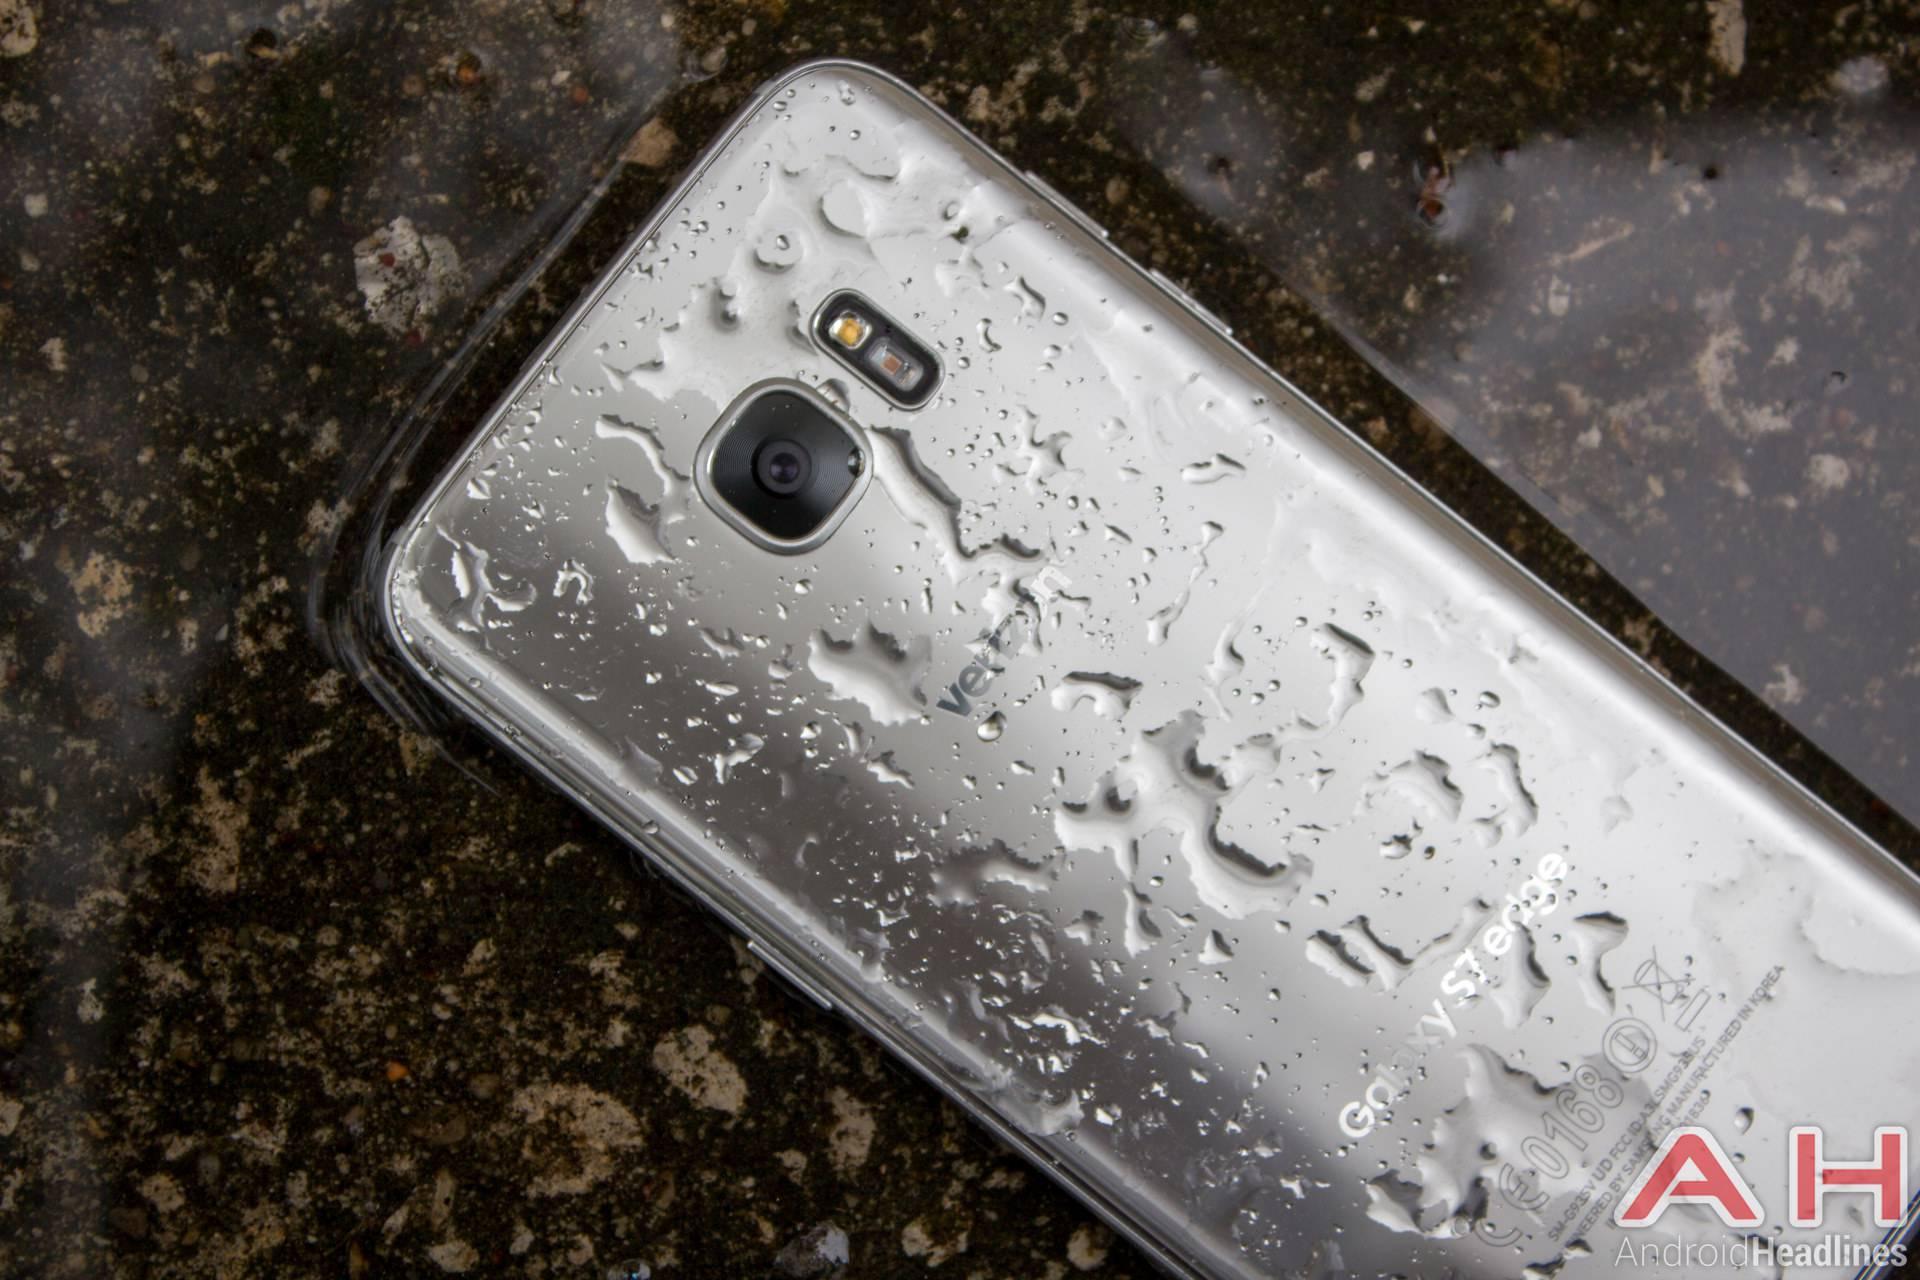 Samsung-Galaxy-S7-Edge-AH-NS-wet-titanium-03-verizon